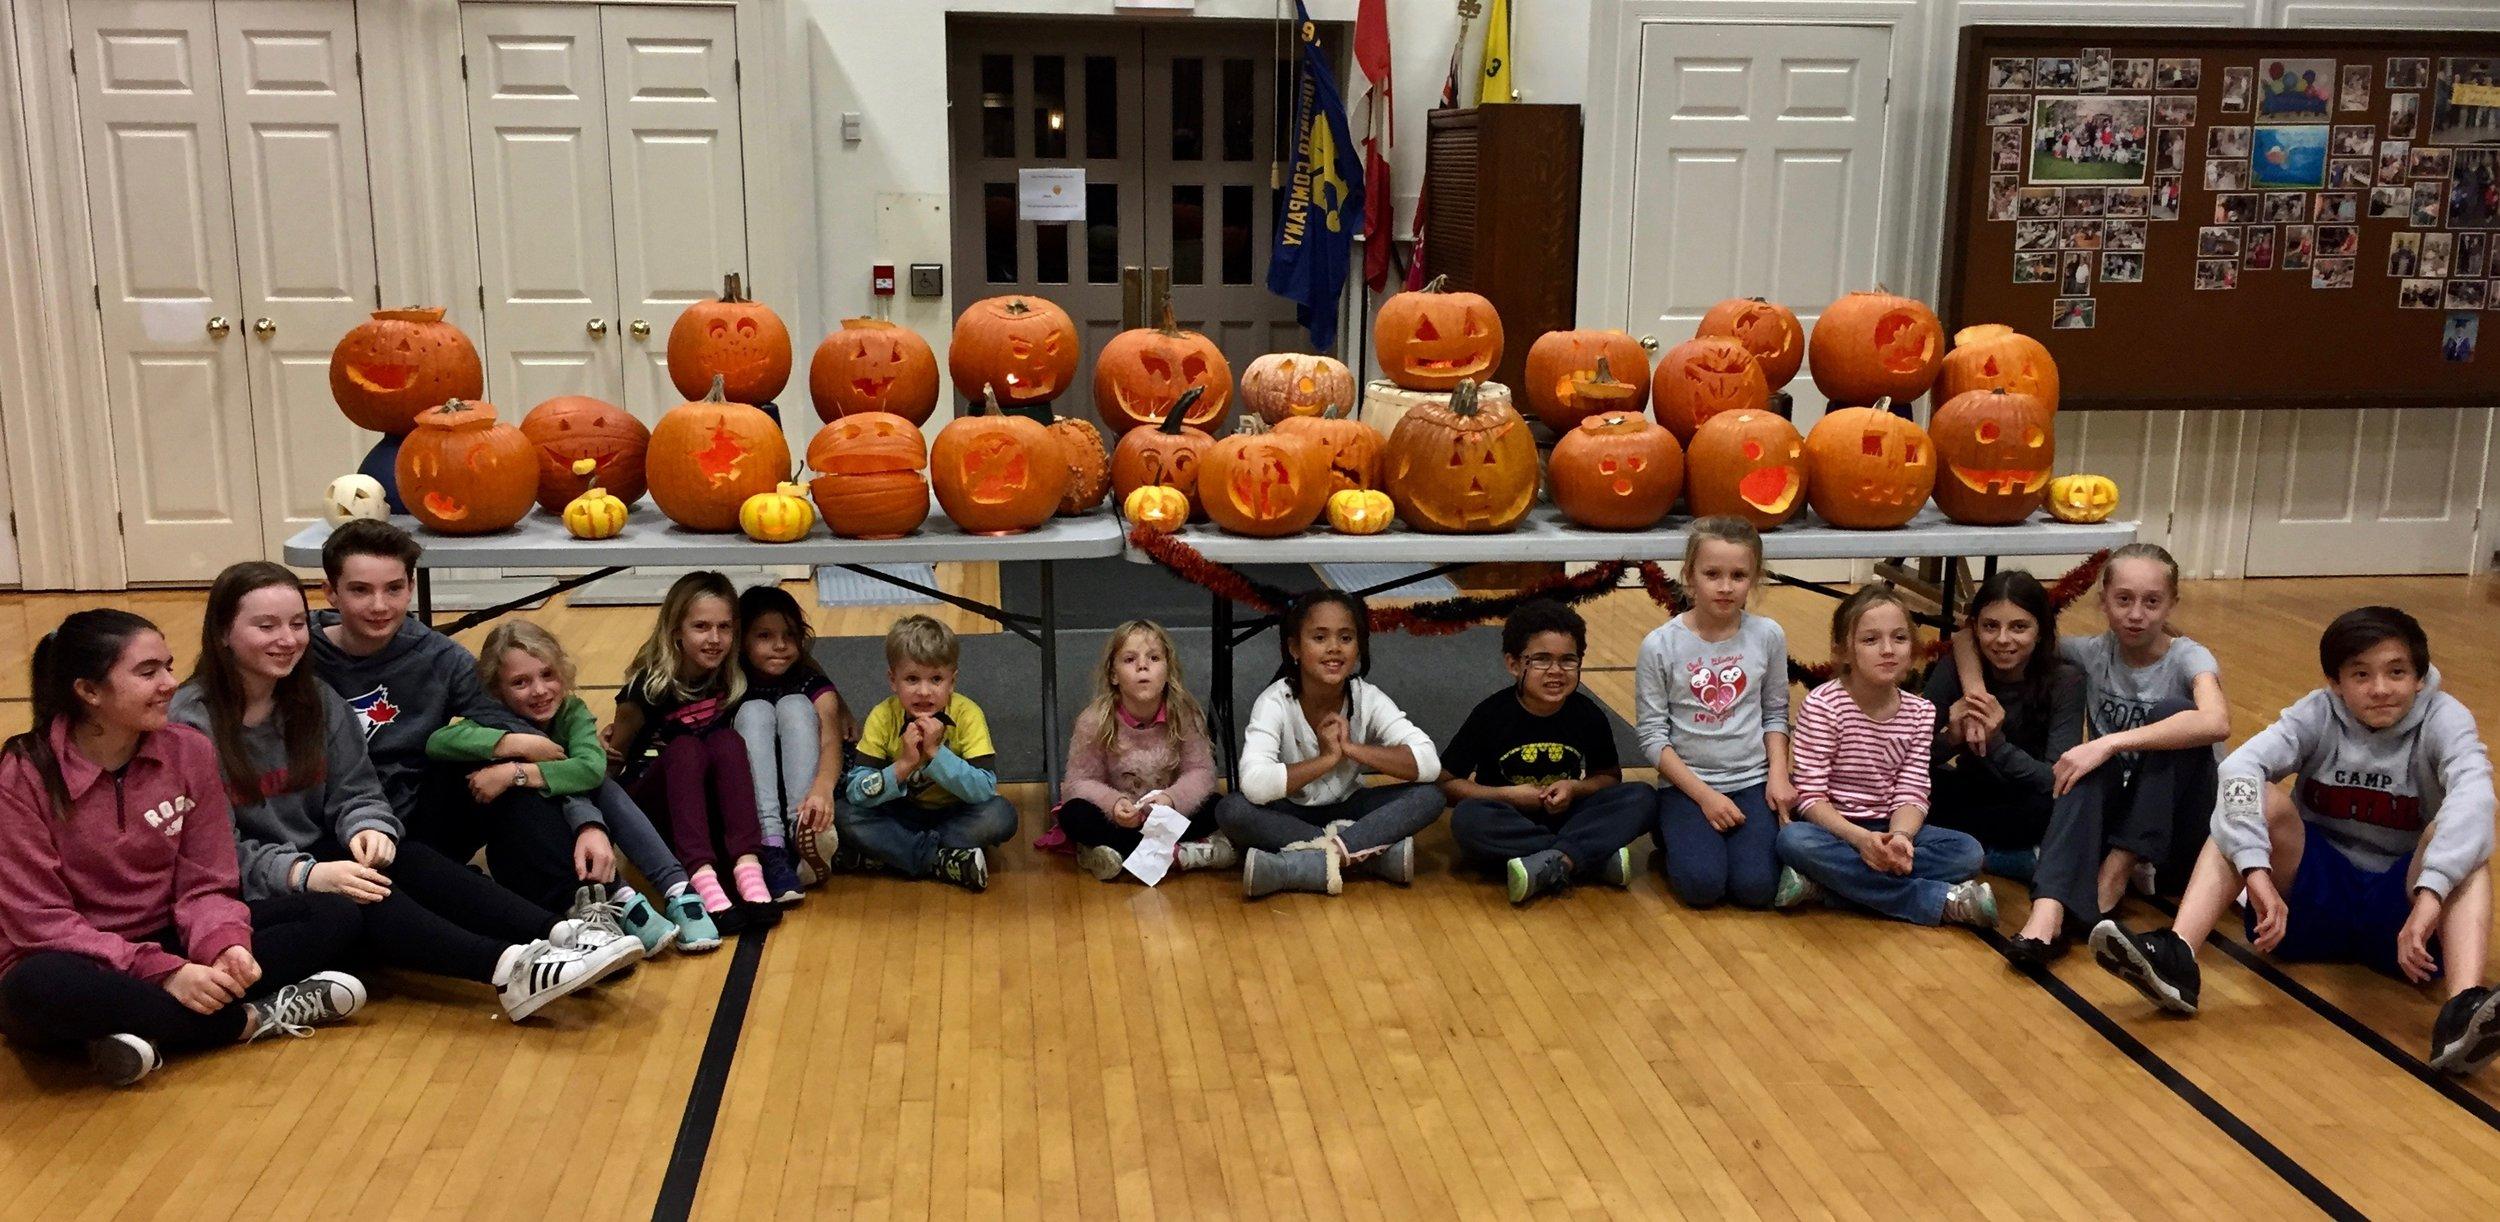 Pumpkin Party 2017!